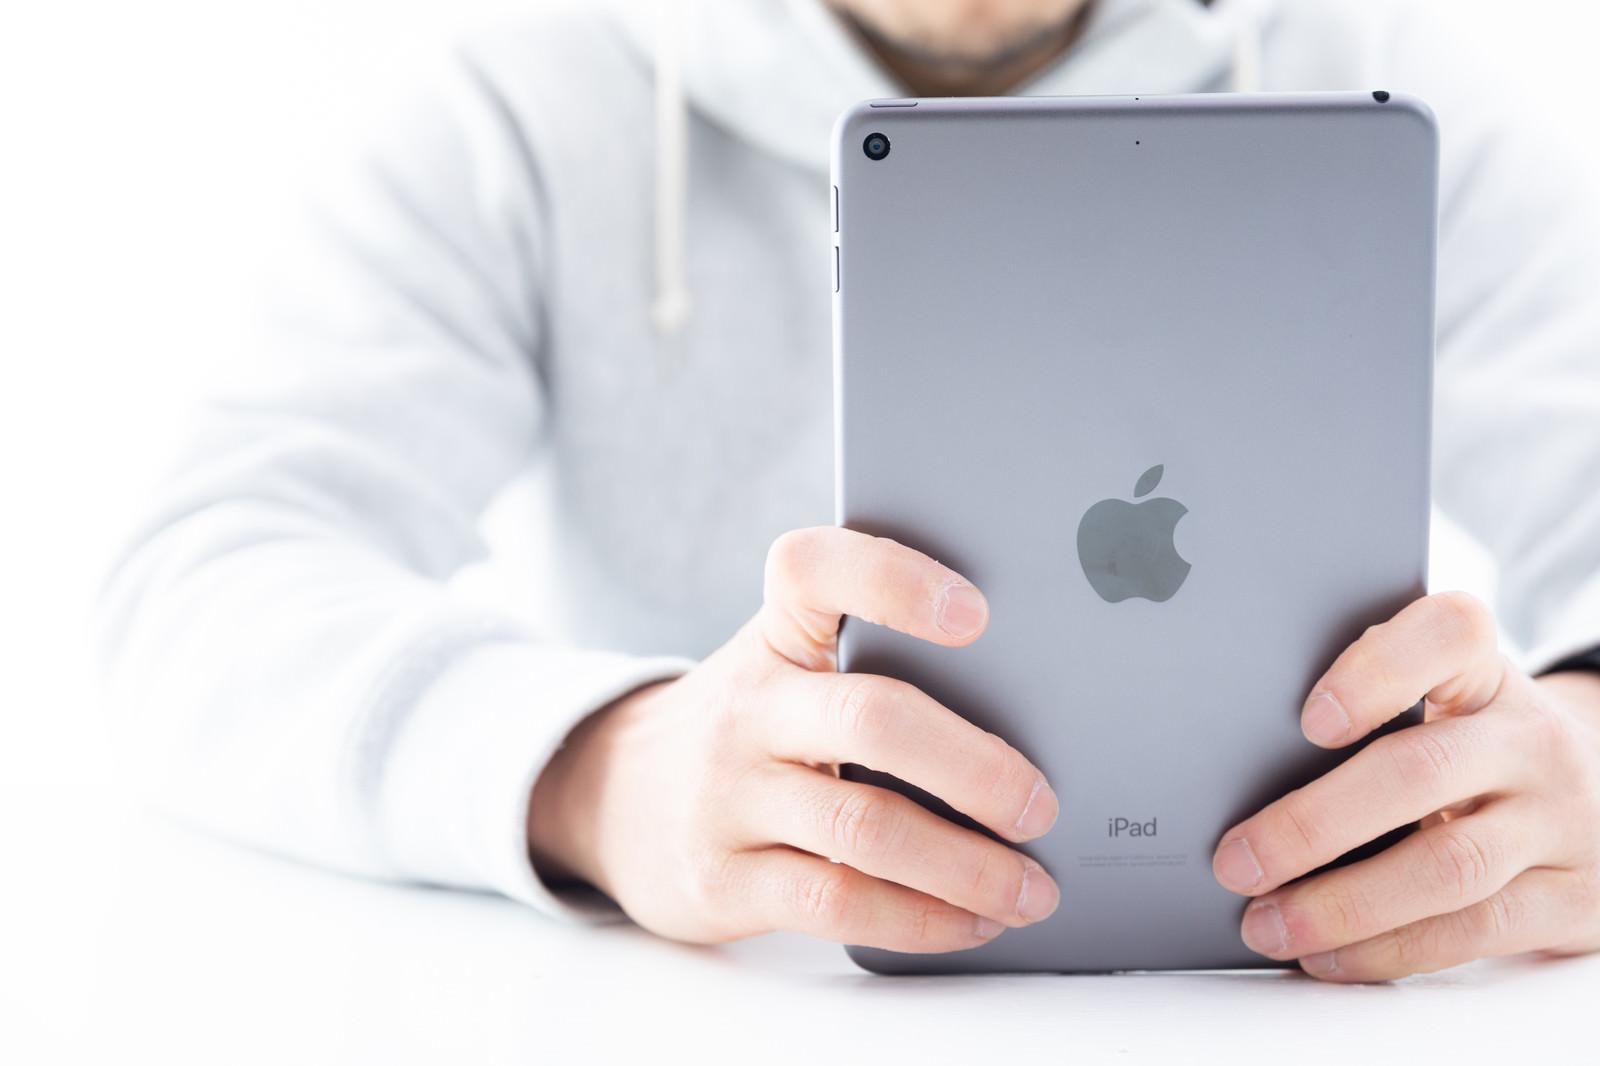 「iPadminiのカメラ機能をチェックする」の写真[モデル:g.O.R.i]